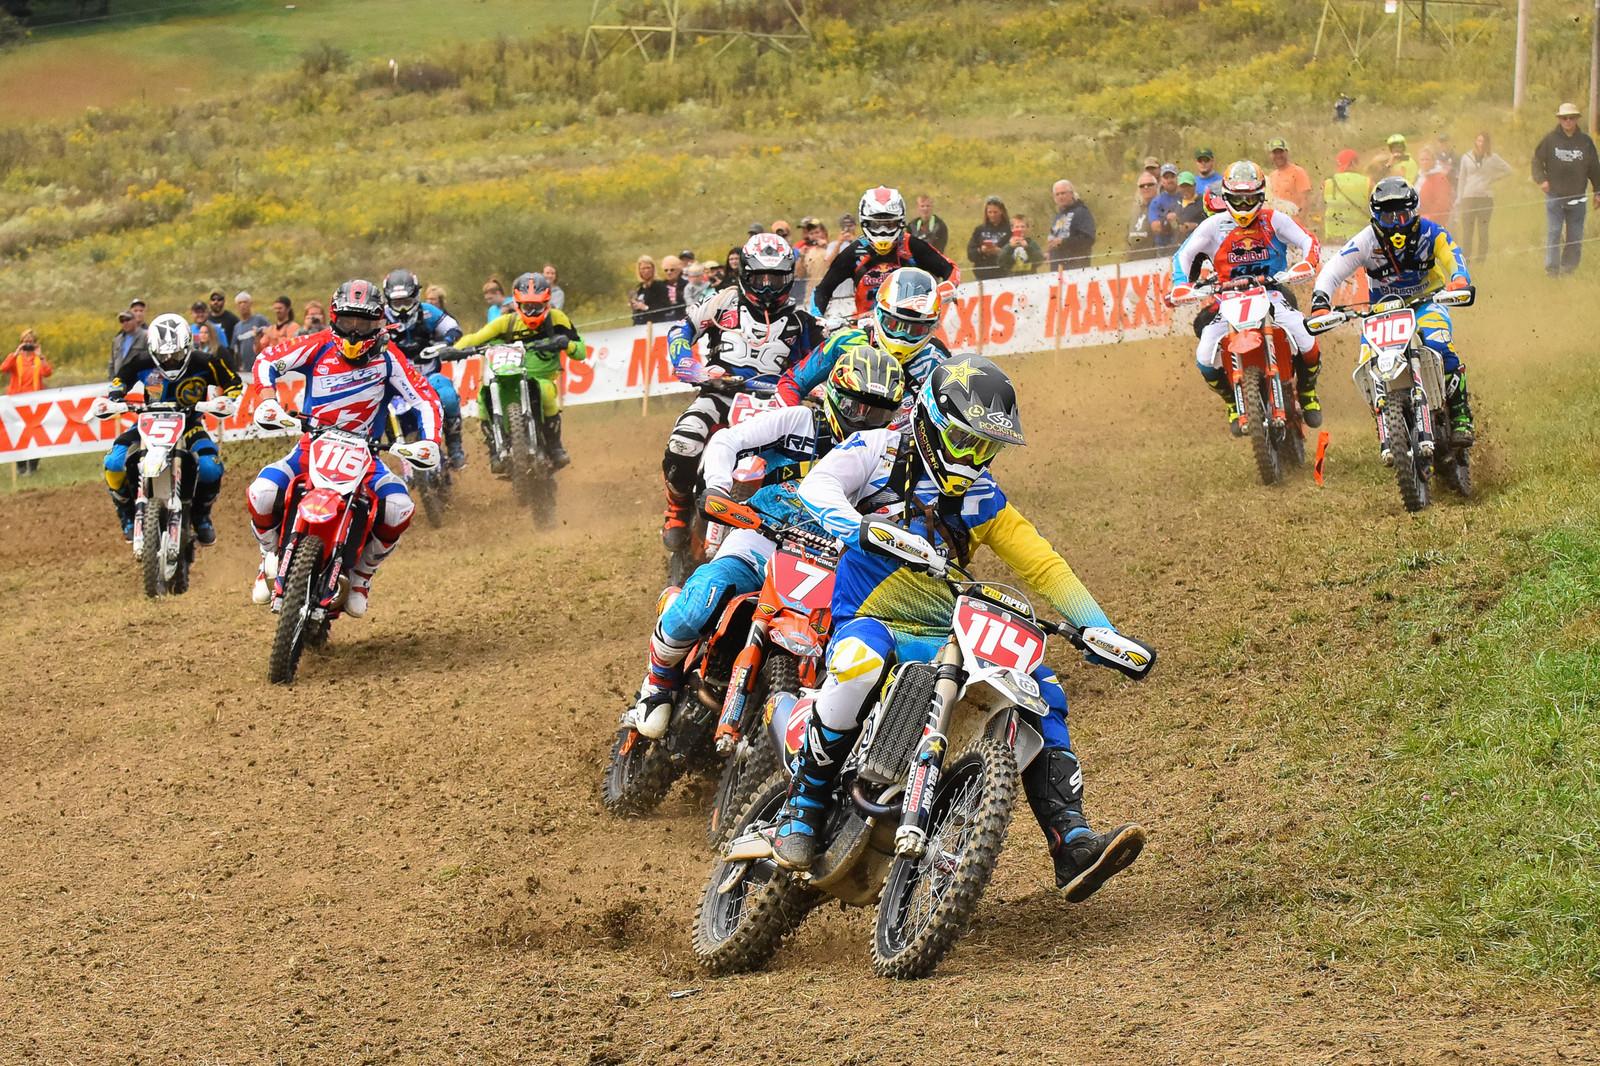 Josh Strang - Powerline Park GNCC - Motocross Pictures - Vital MX